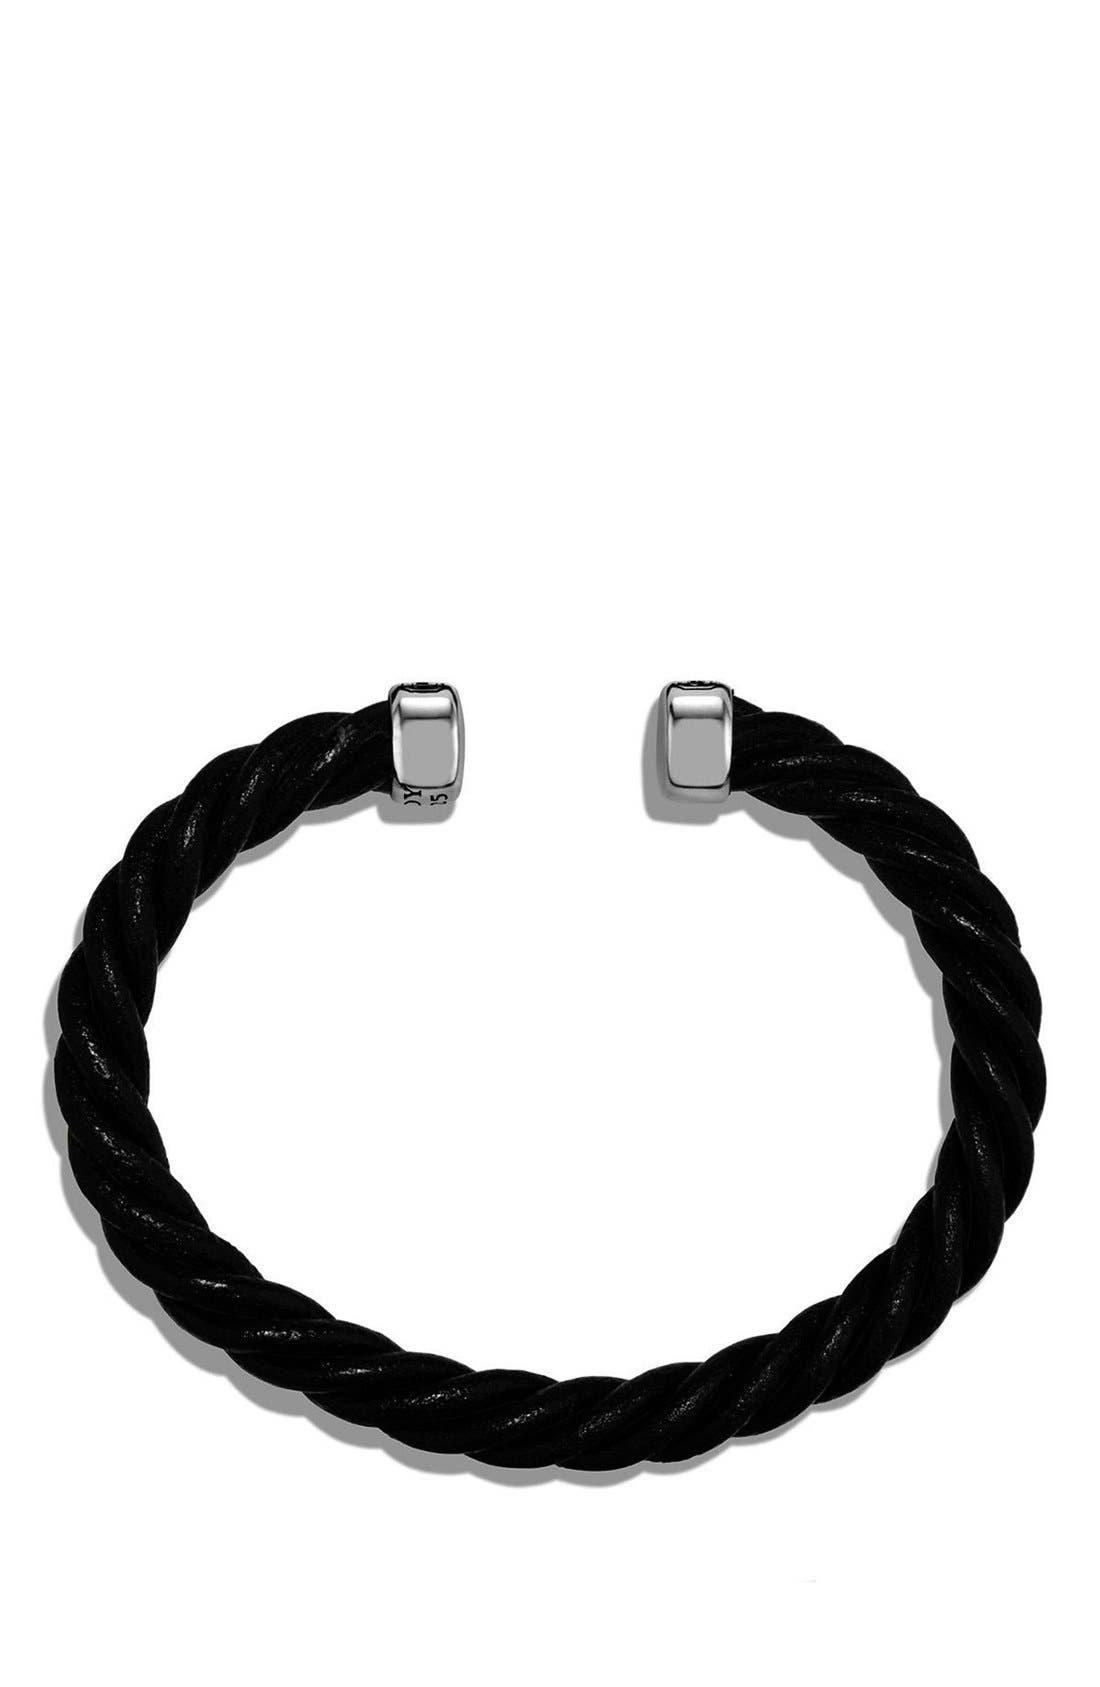 Leather Cuff Bracelet,                             Alternate thumbnail 3, color,                             SILVER/ BLACK LEATHER